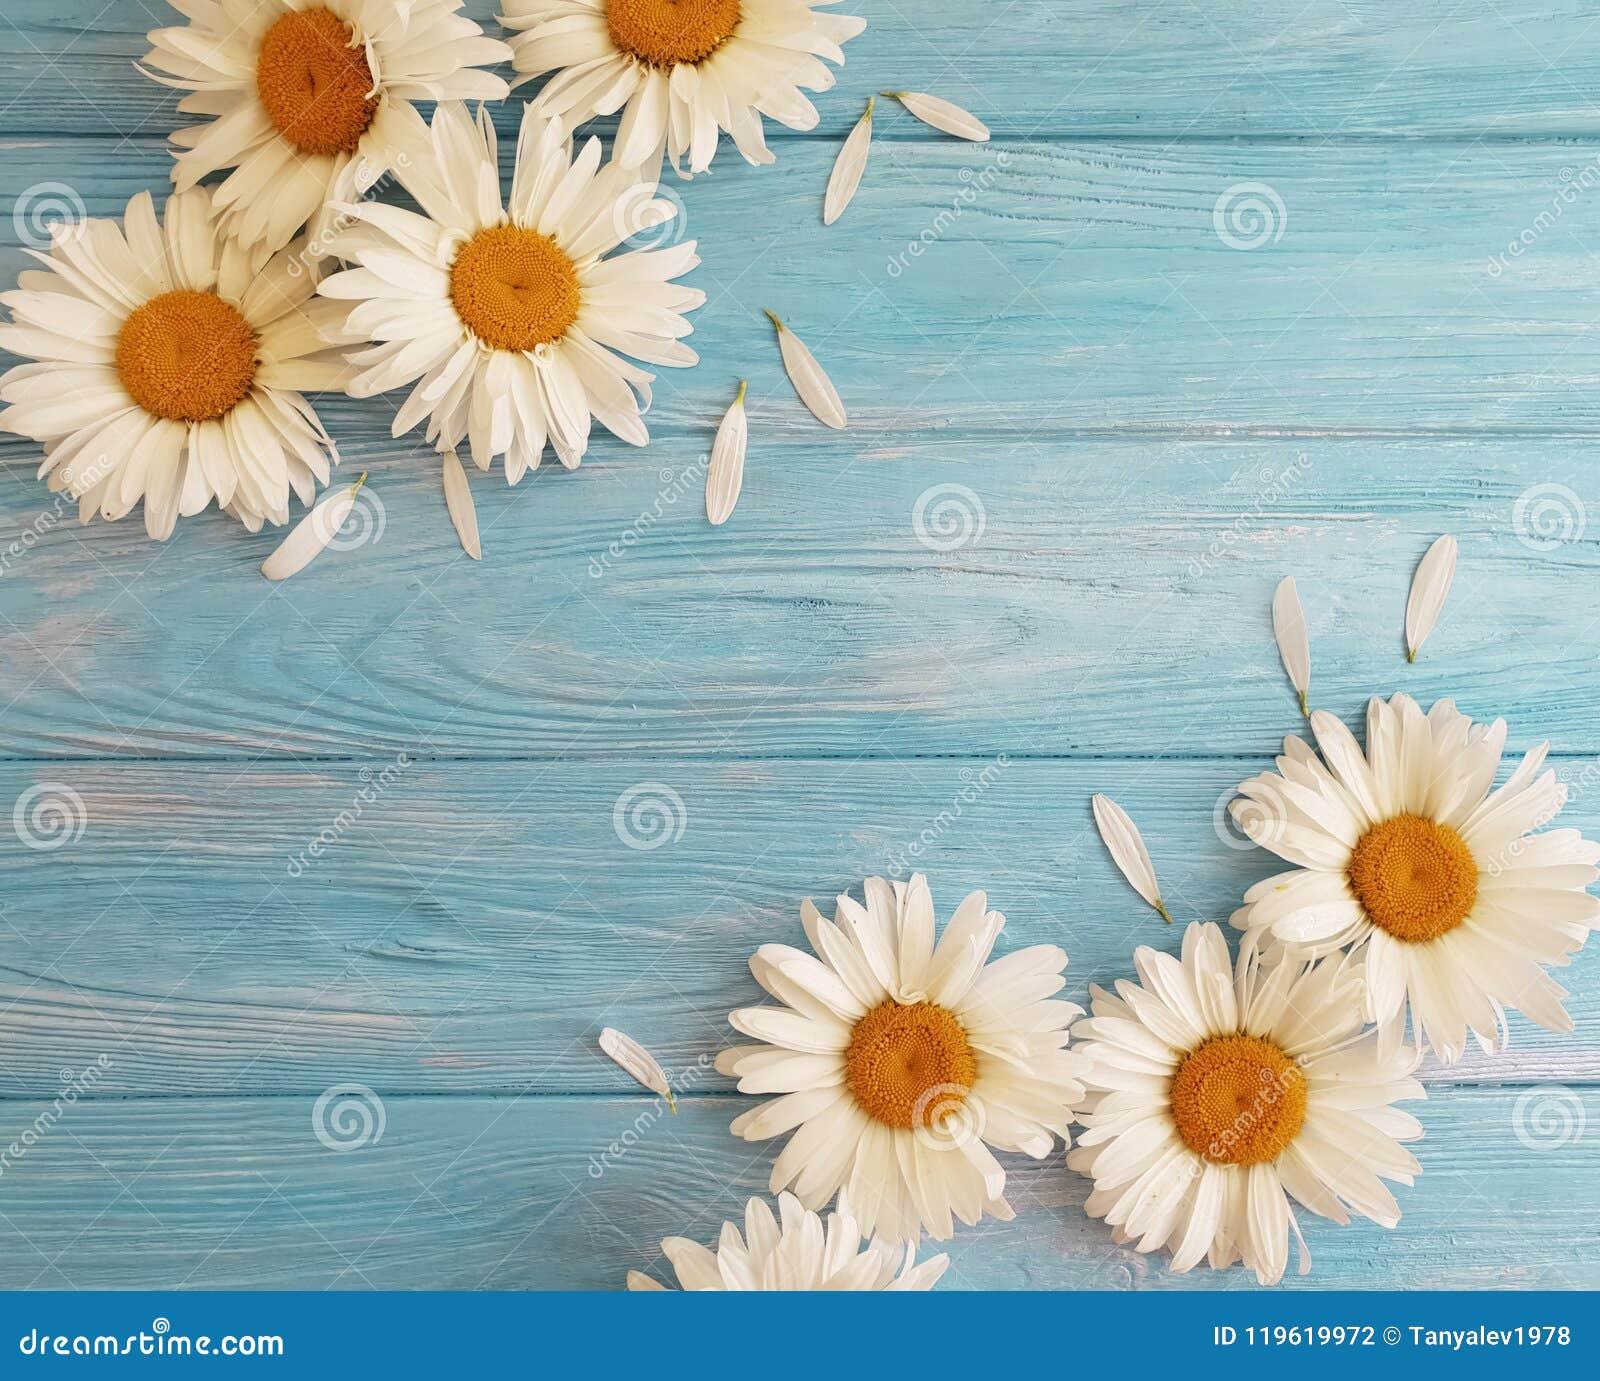 Chamomile natural on a blue wooden floral design birthday vintage festive greeting bloom